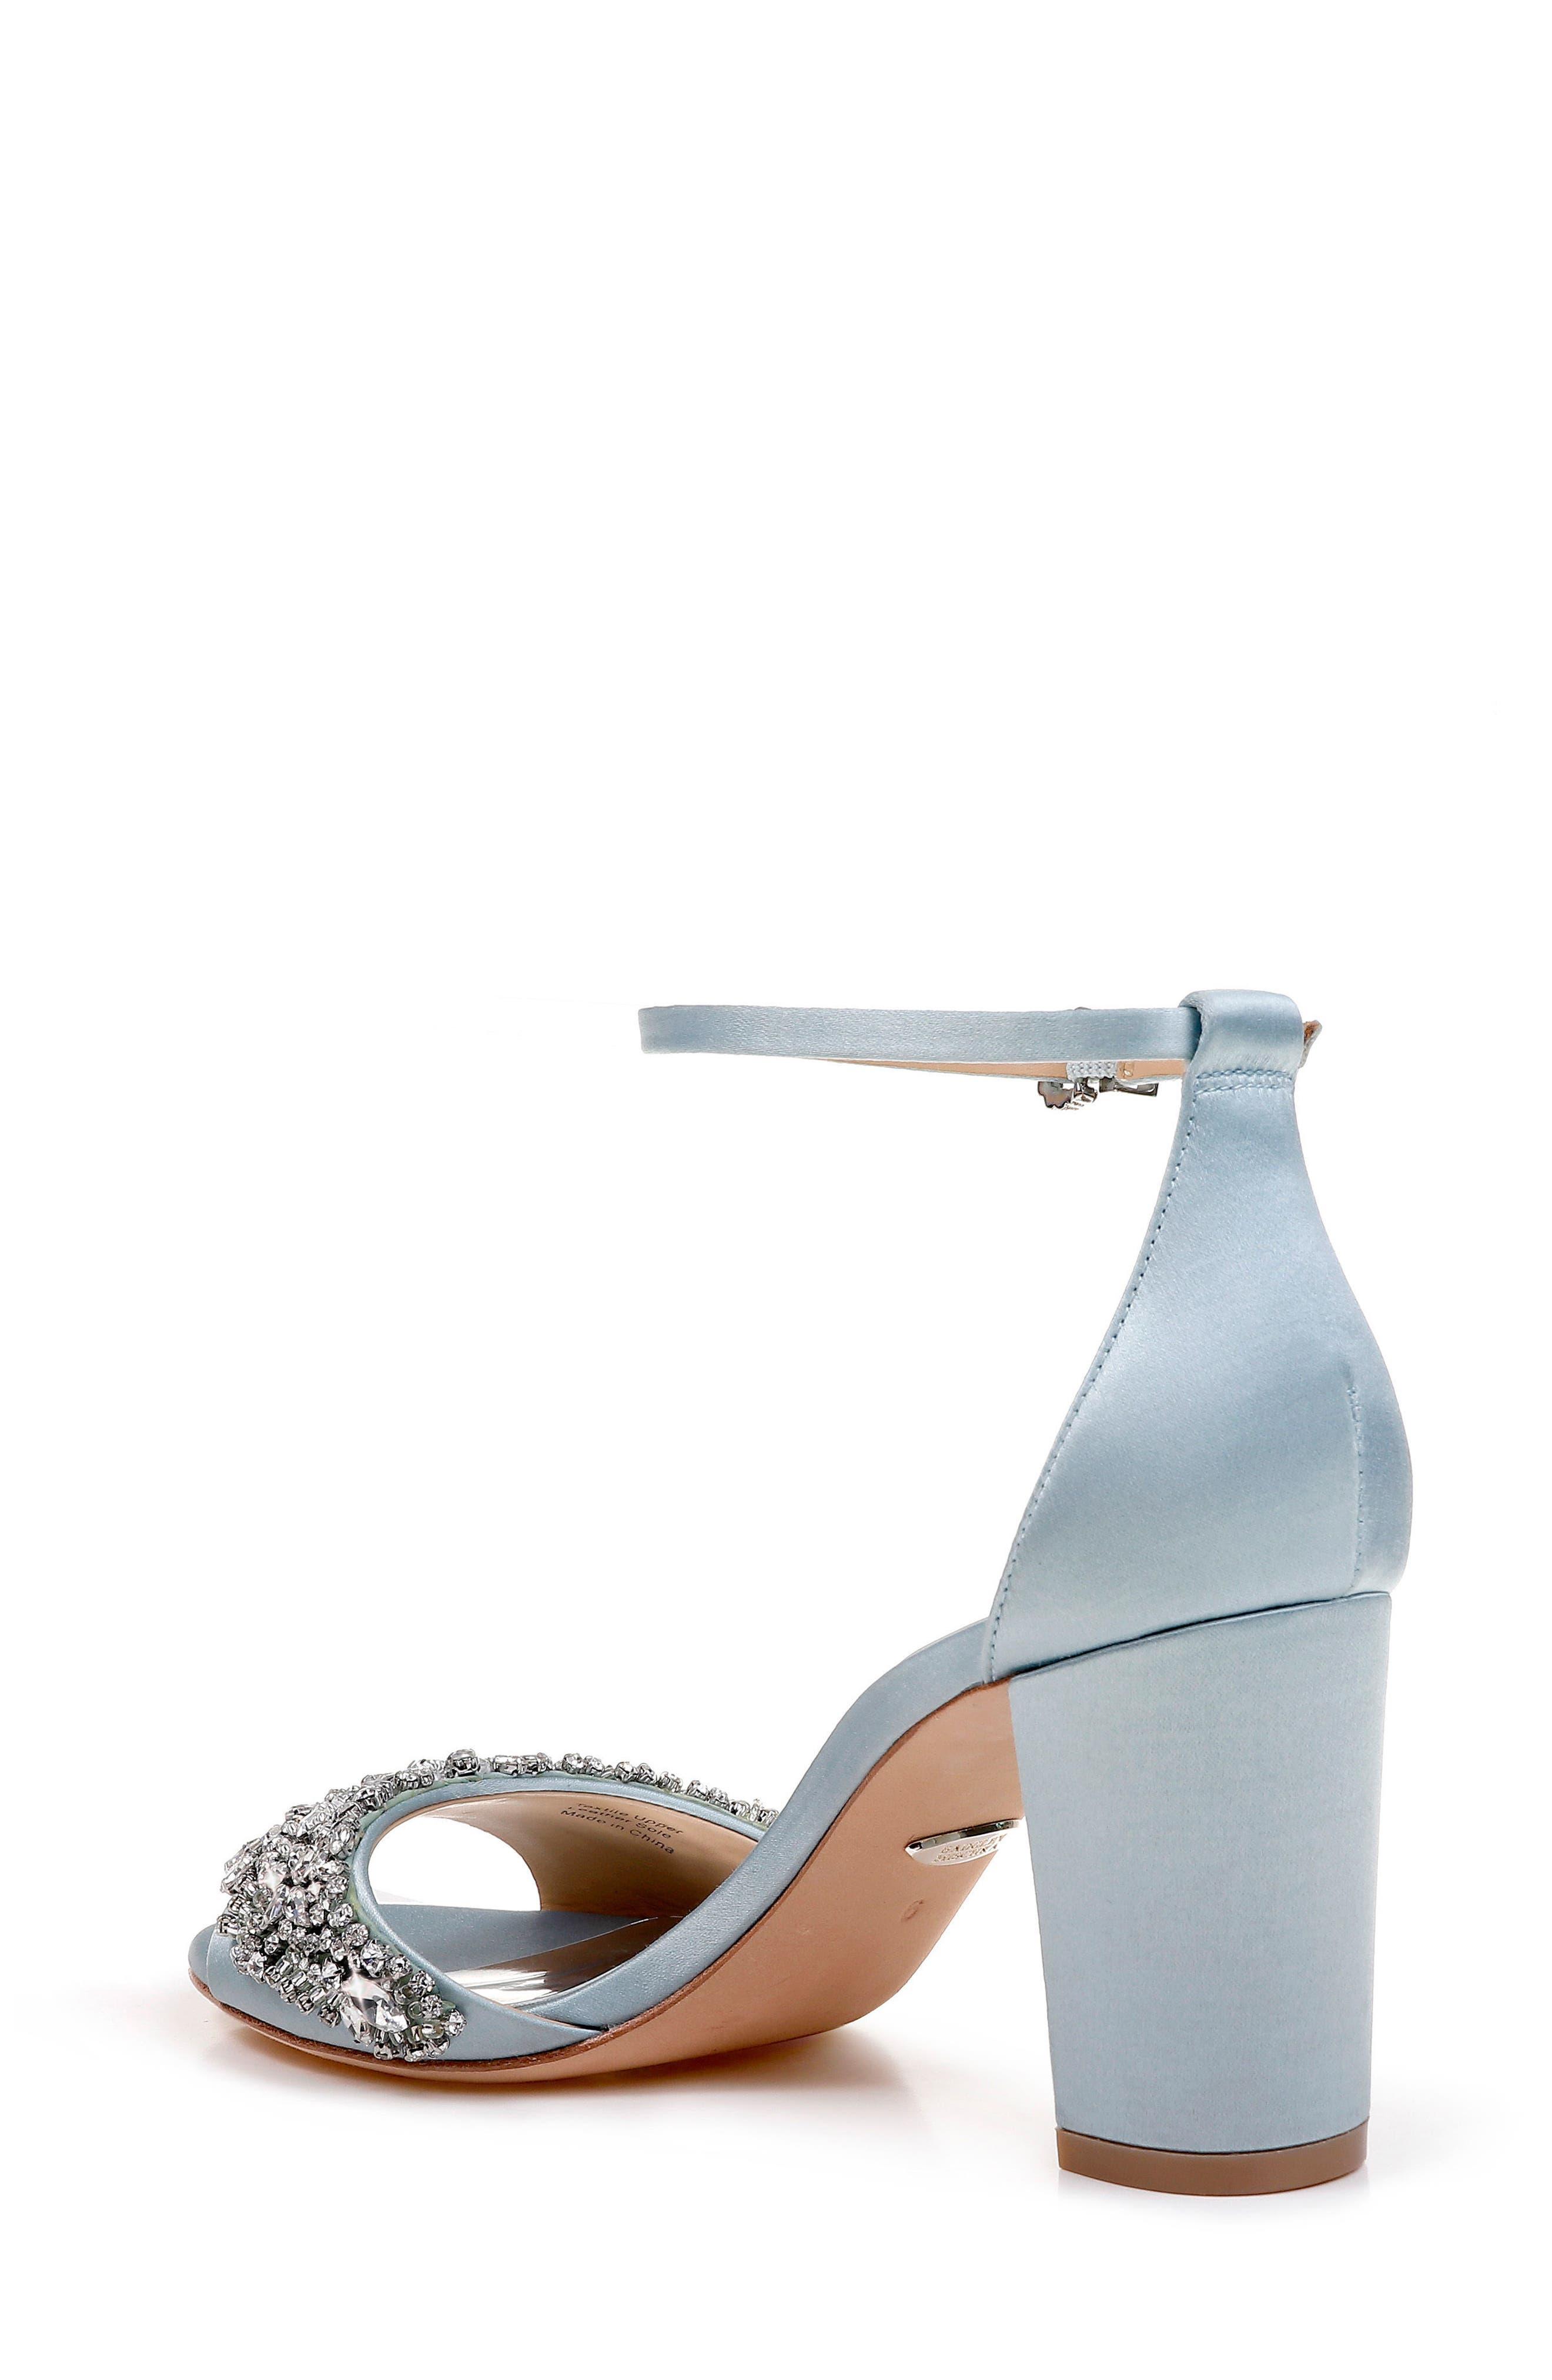 Hines Embellished Block Heel Sandal,                             Alternate thumbnail 9, color,